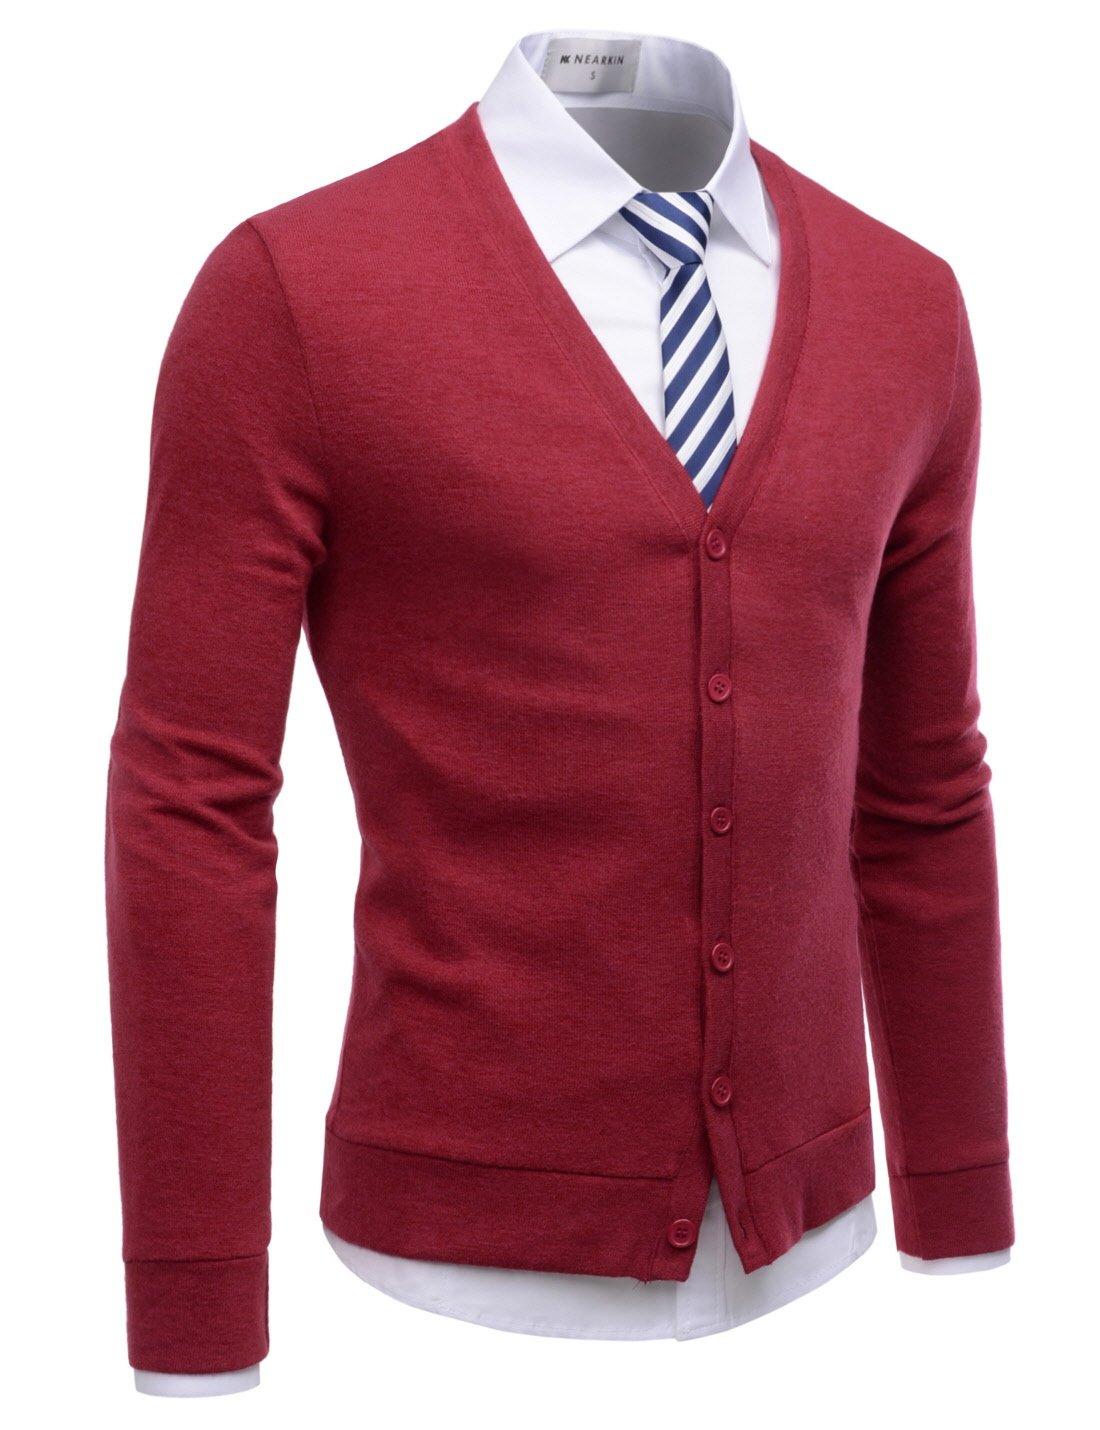 NEARKIN (NKNKCAC1) Mens Knitwear City Casual Slim Cut Long Sleeve Cardigan Sweaters RED US XL(Tag size XL)